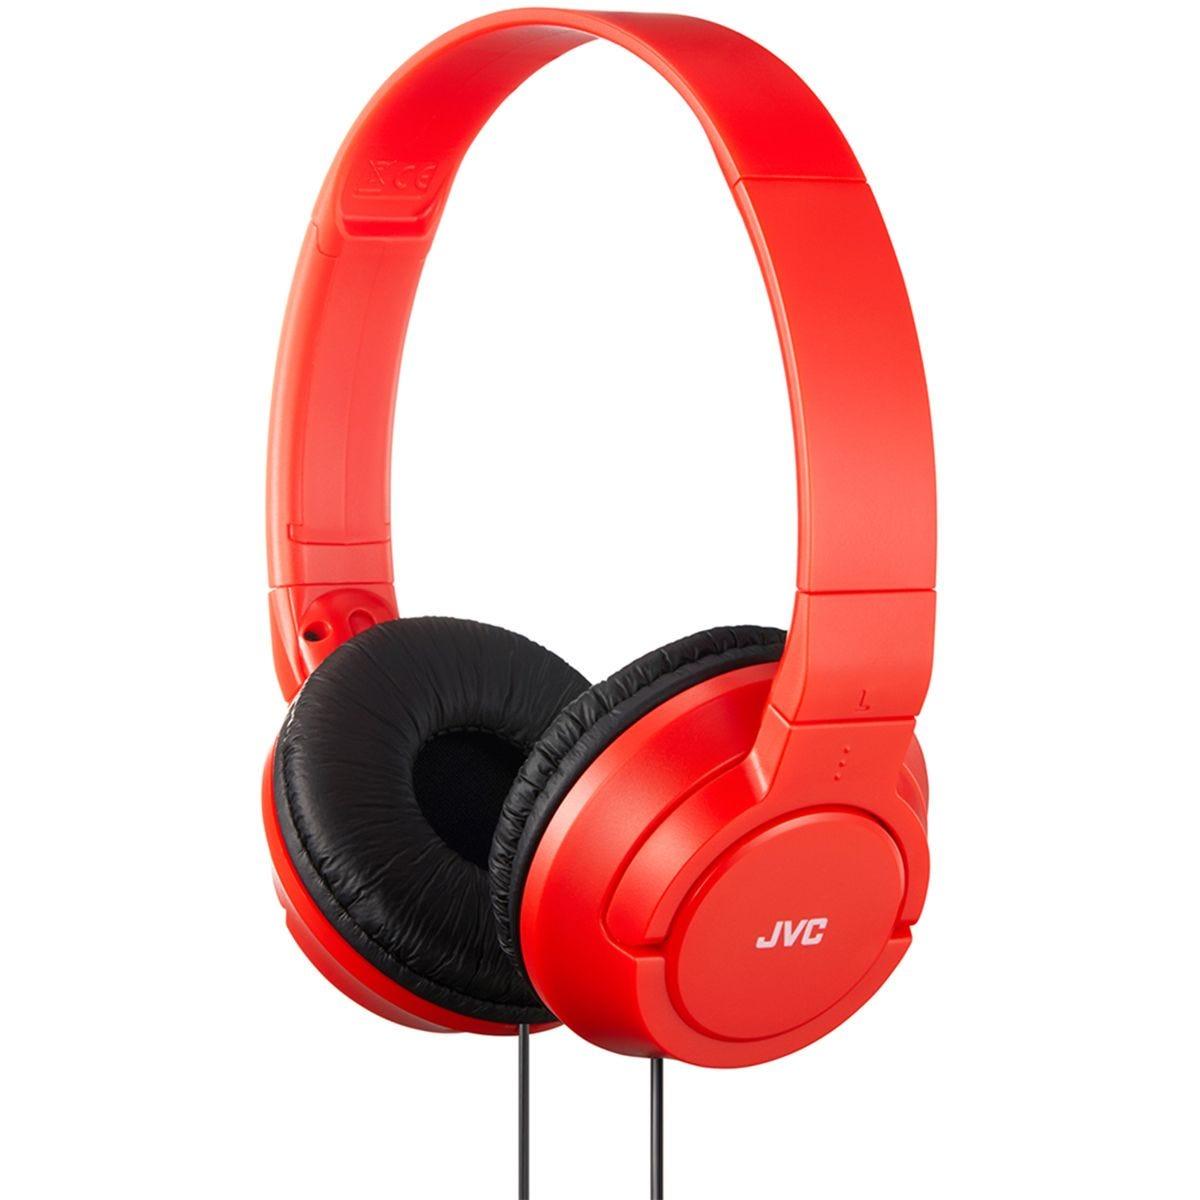 JVC Powerful Bass Headphones - Red